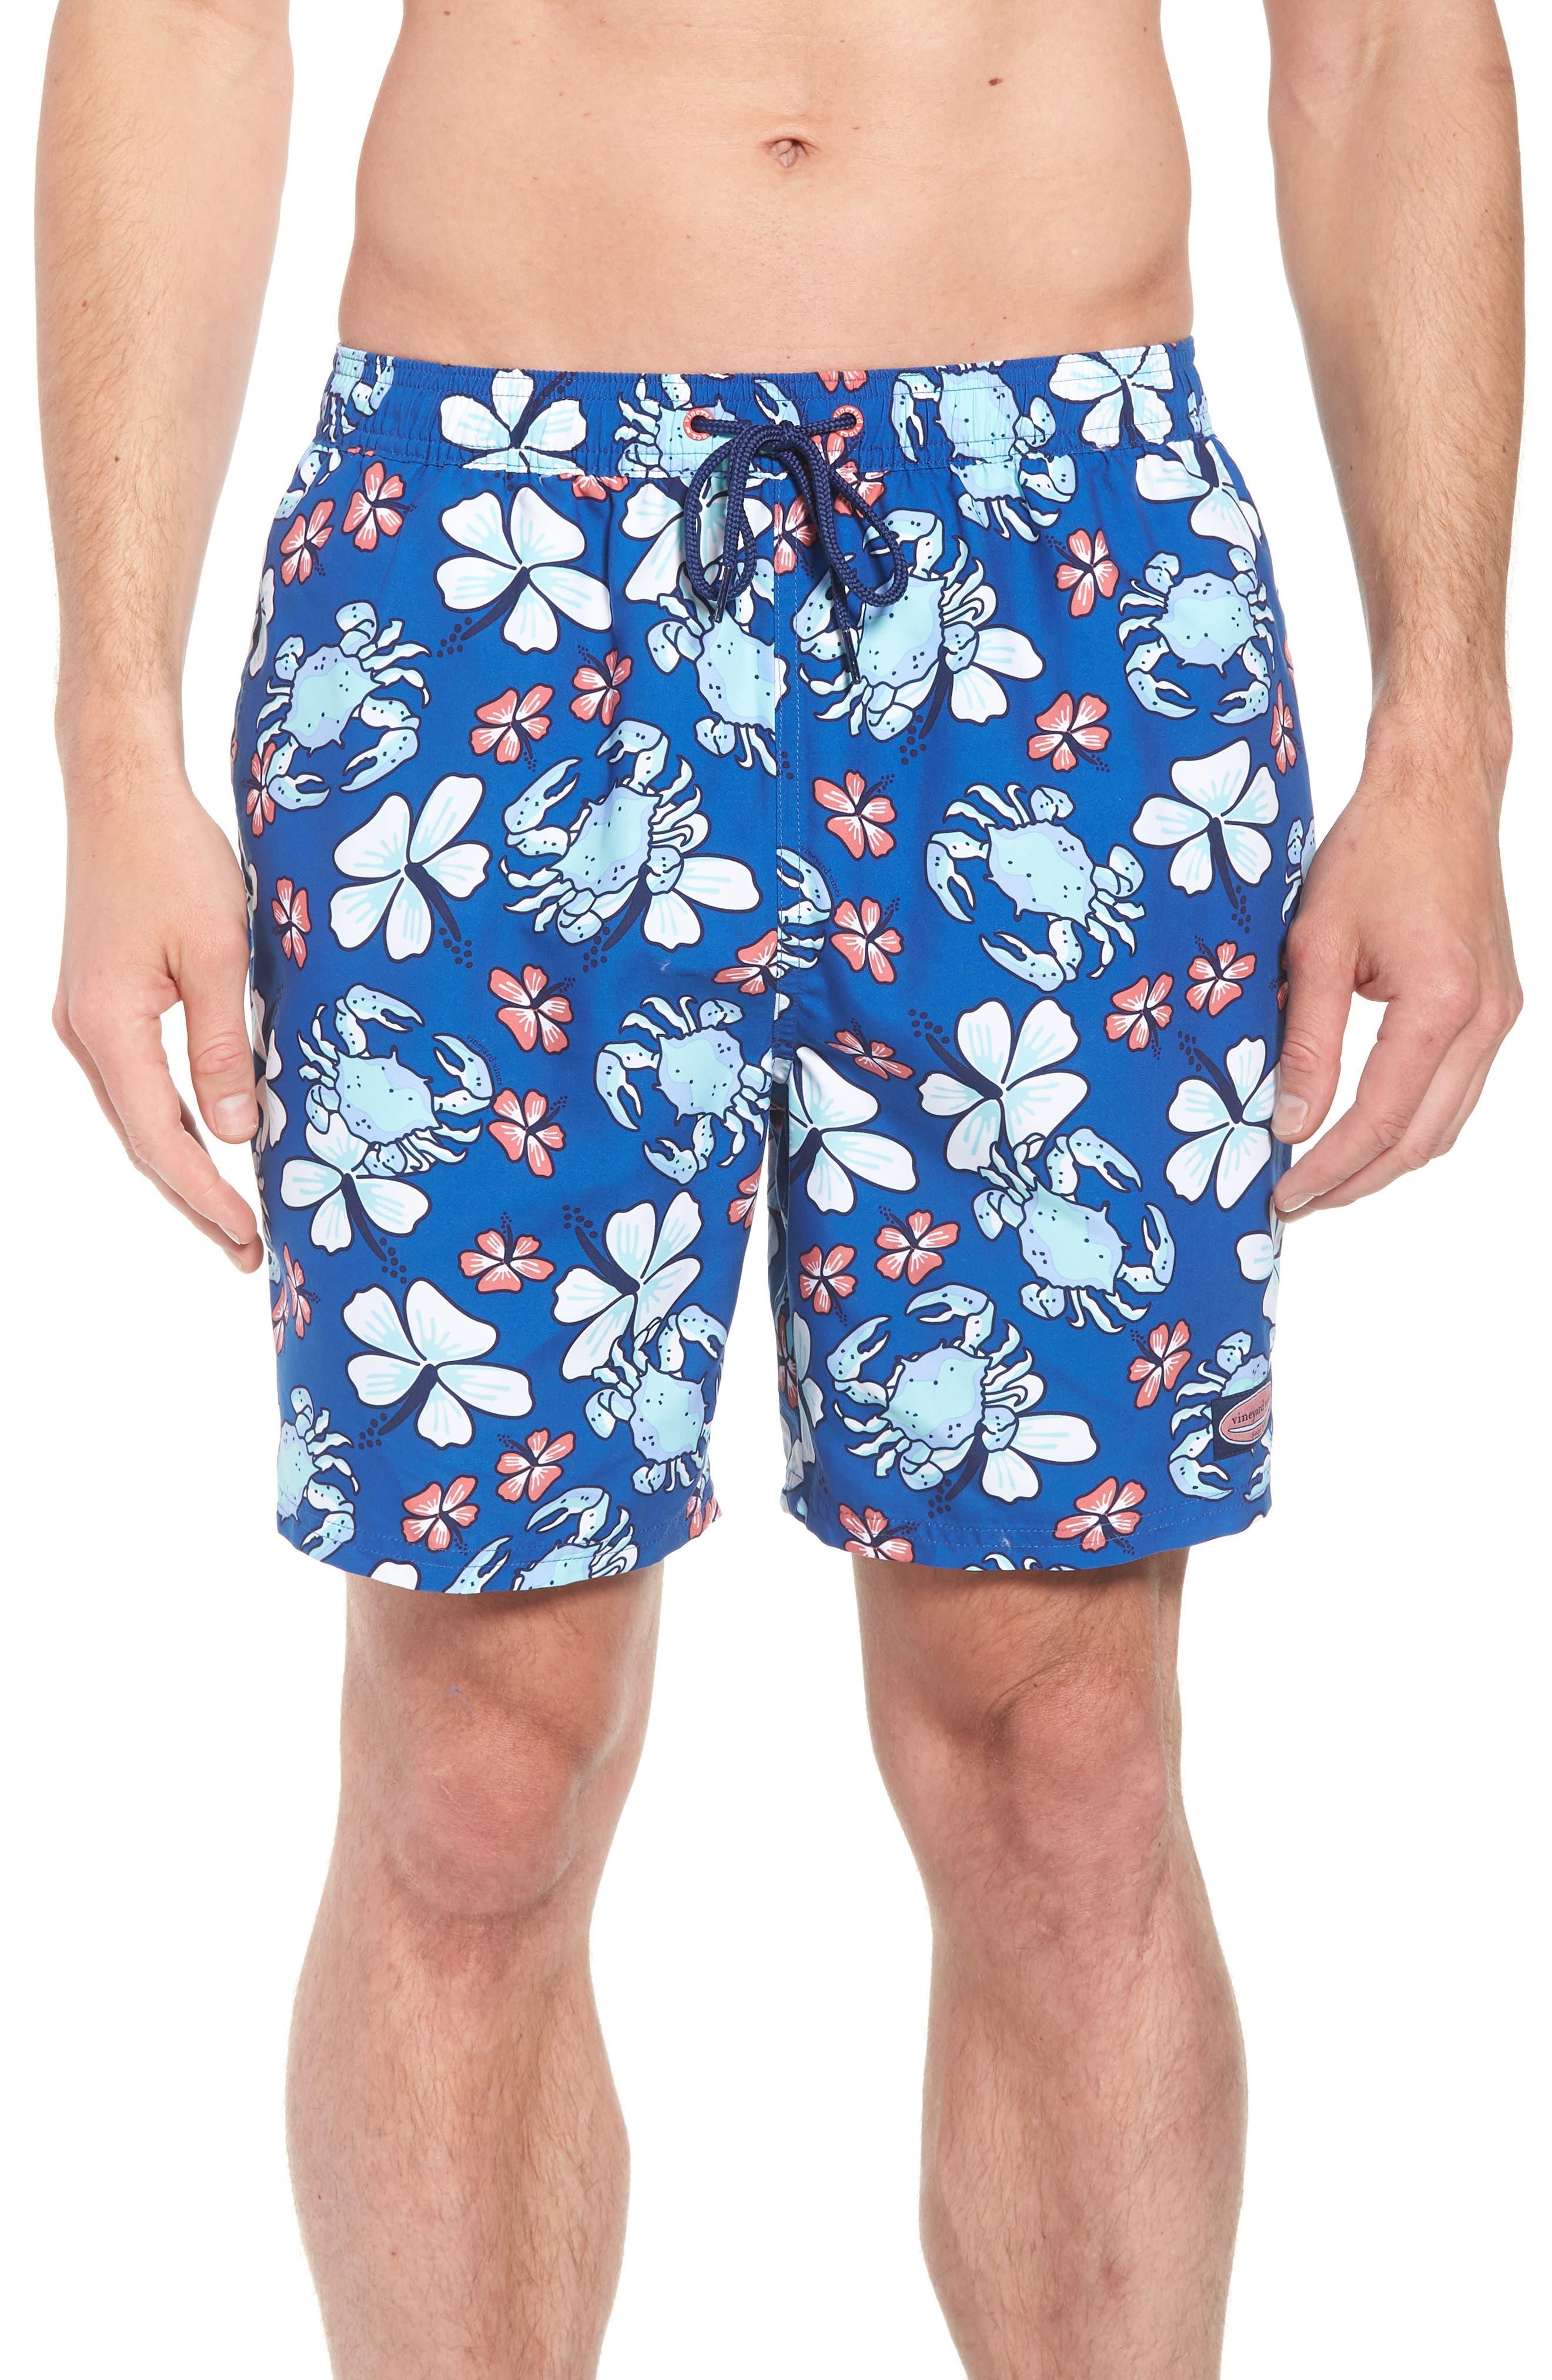 Chappy Crab Floral Swim Trunks,                         Main,                         color, Yacht Blue